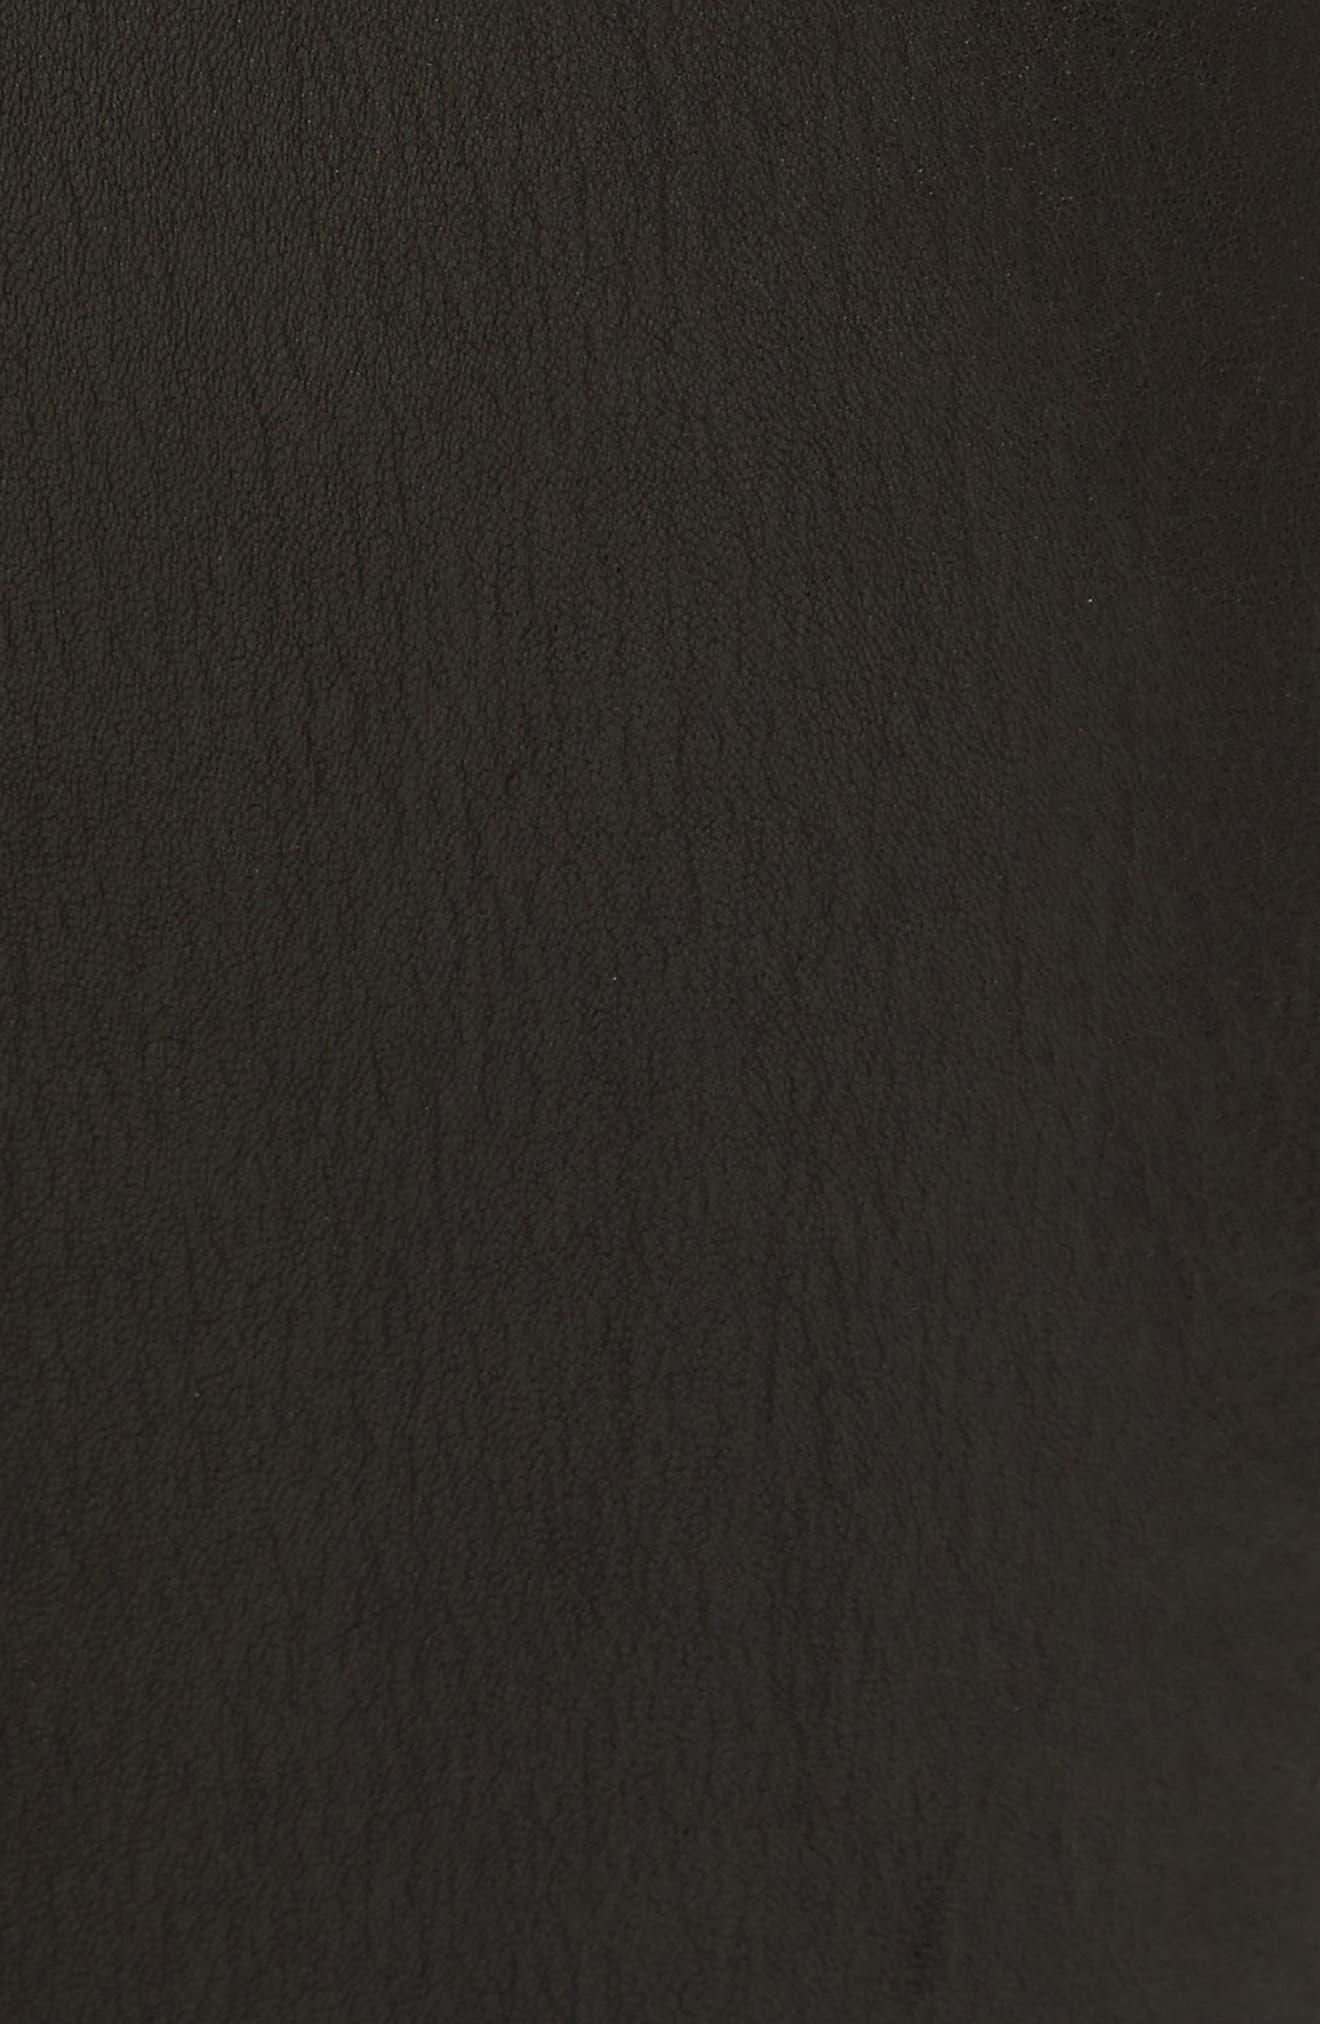 Lambskin Leather Pants,                             Alternate thumbnail 18, color,